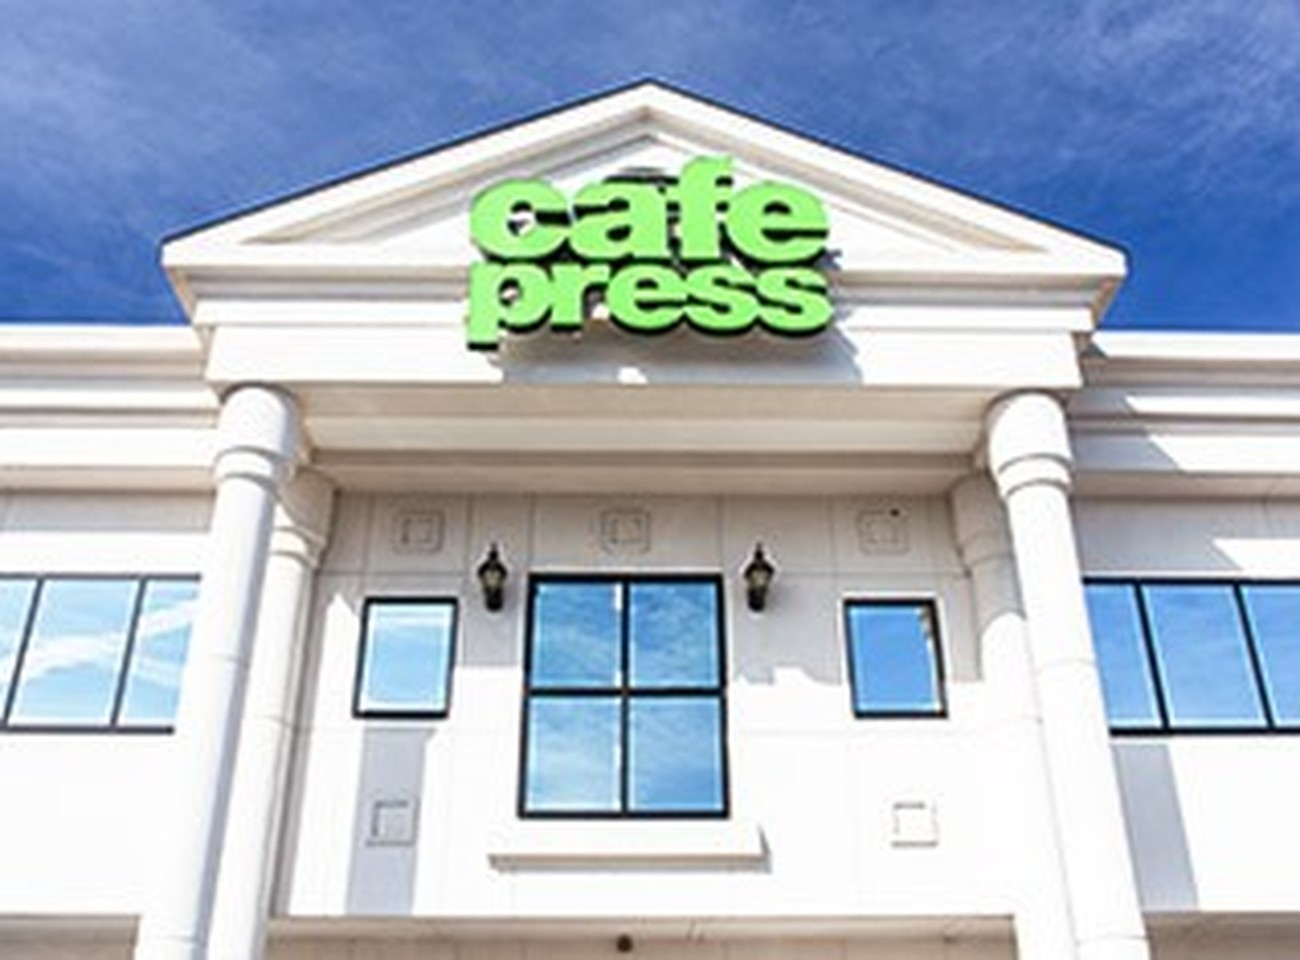 CafePress Careers